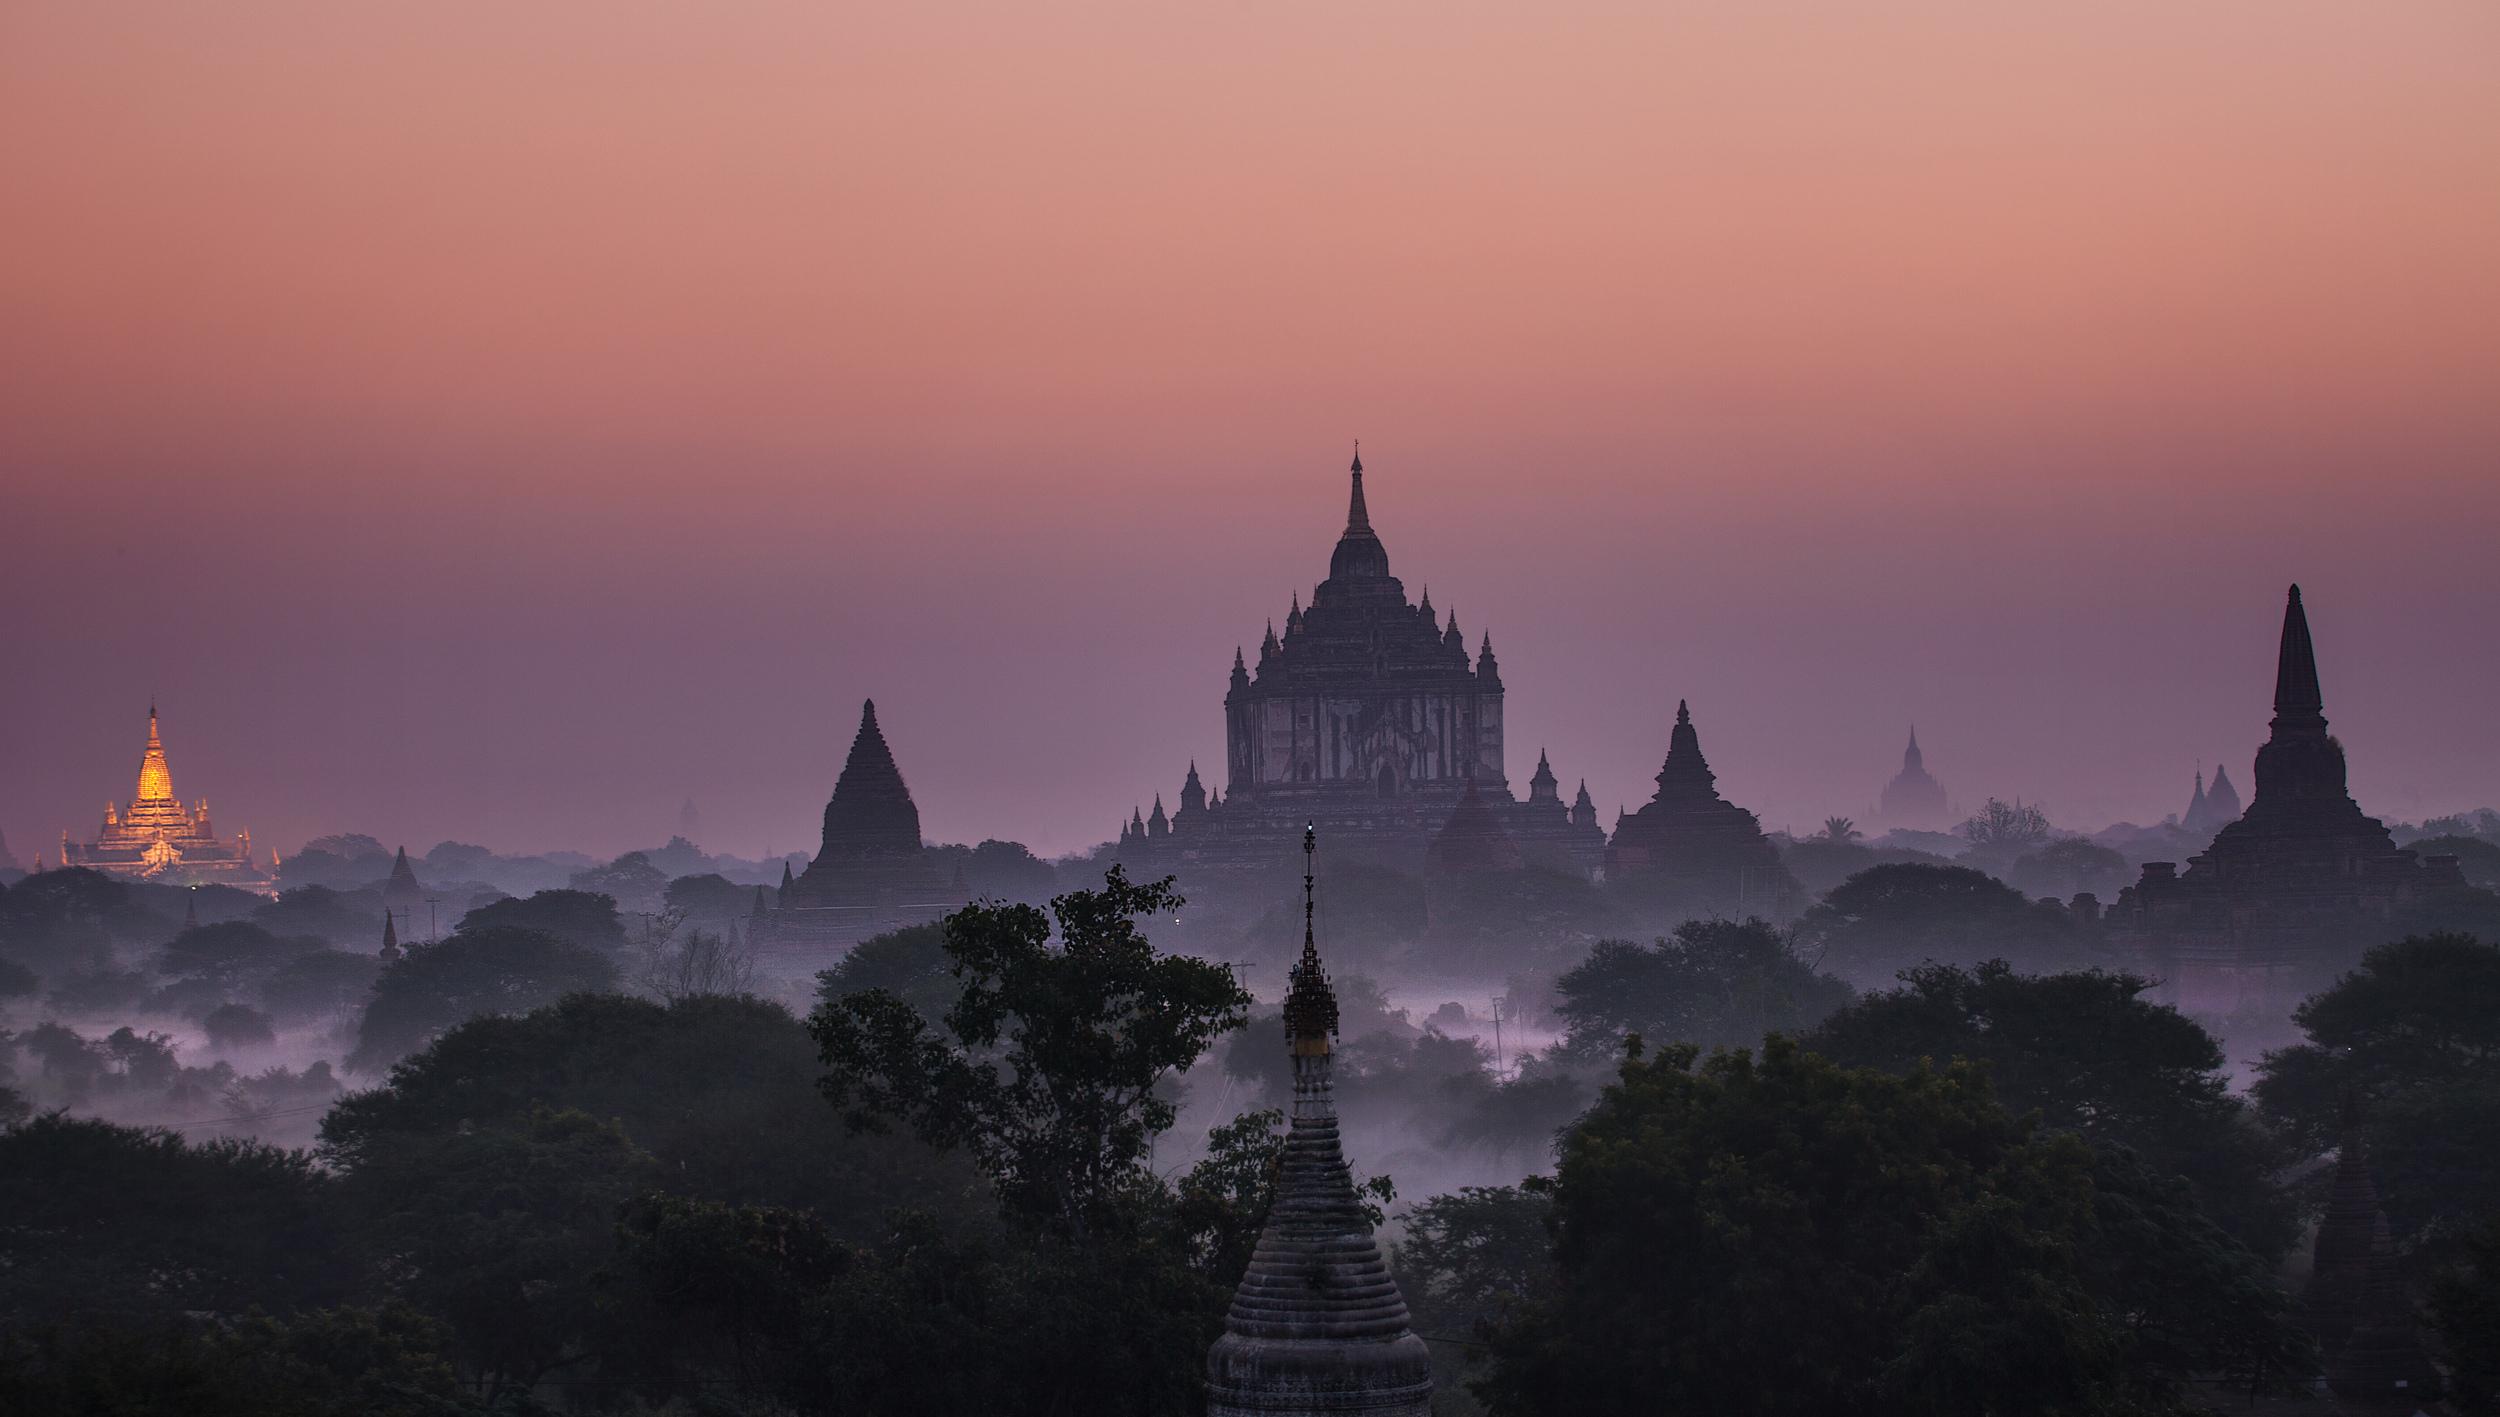 Early dawn light at the Thatbyinnyu temple